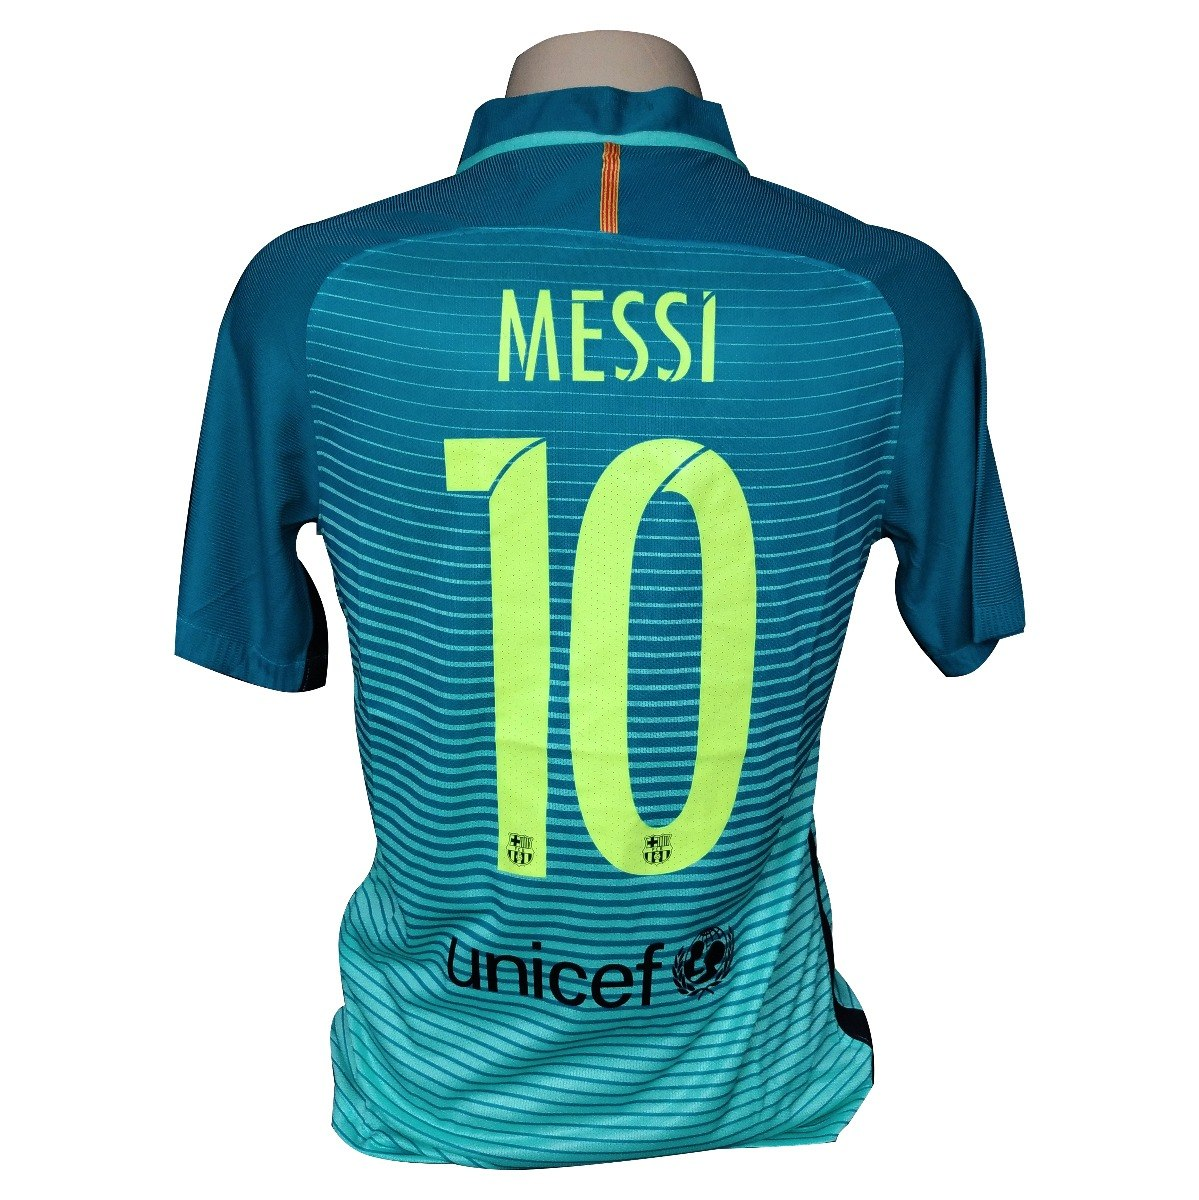 camisa barcelona nike third player 16 17  10 messi. Carregando zoom. 83ee29f62424e